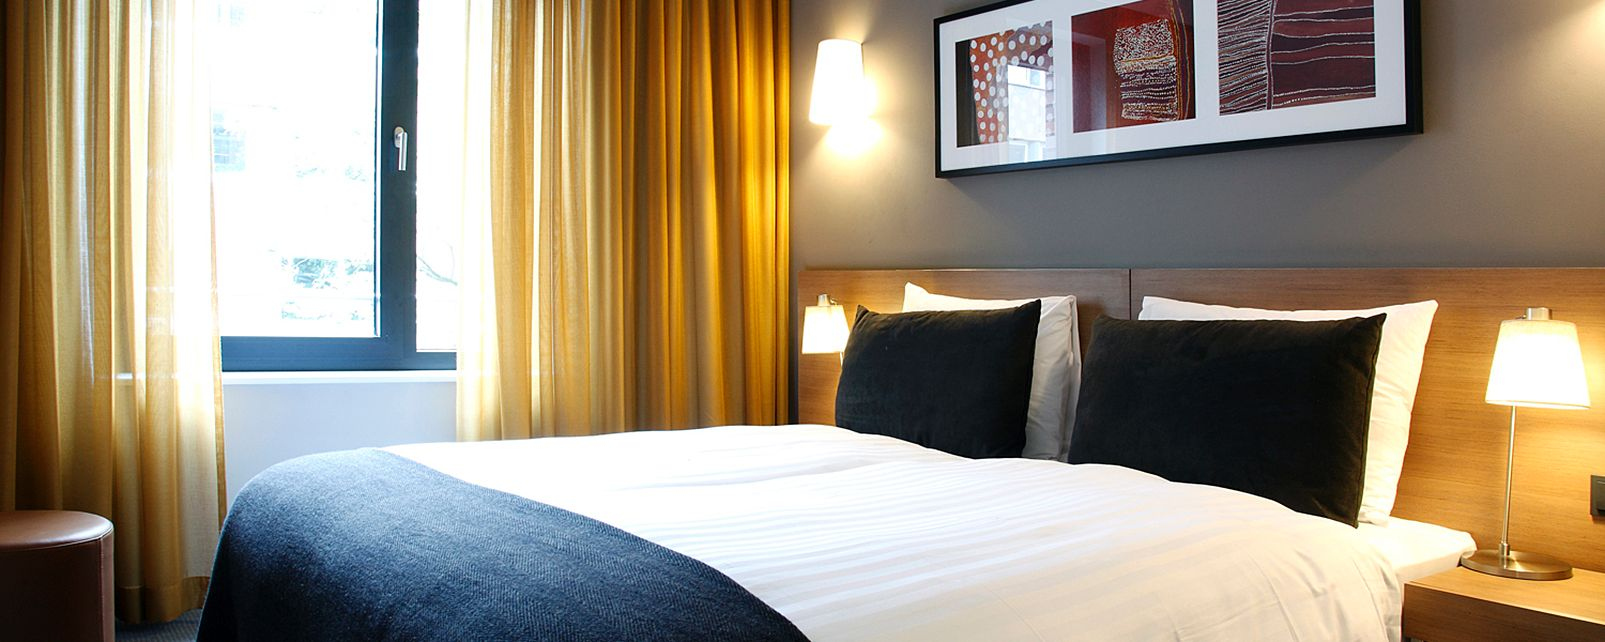 Hotel Adina Apartment Ht Michel